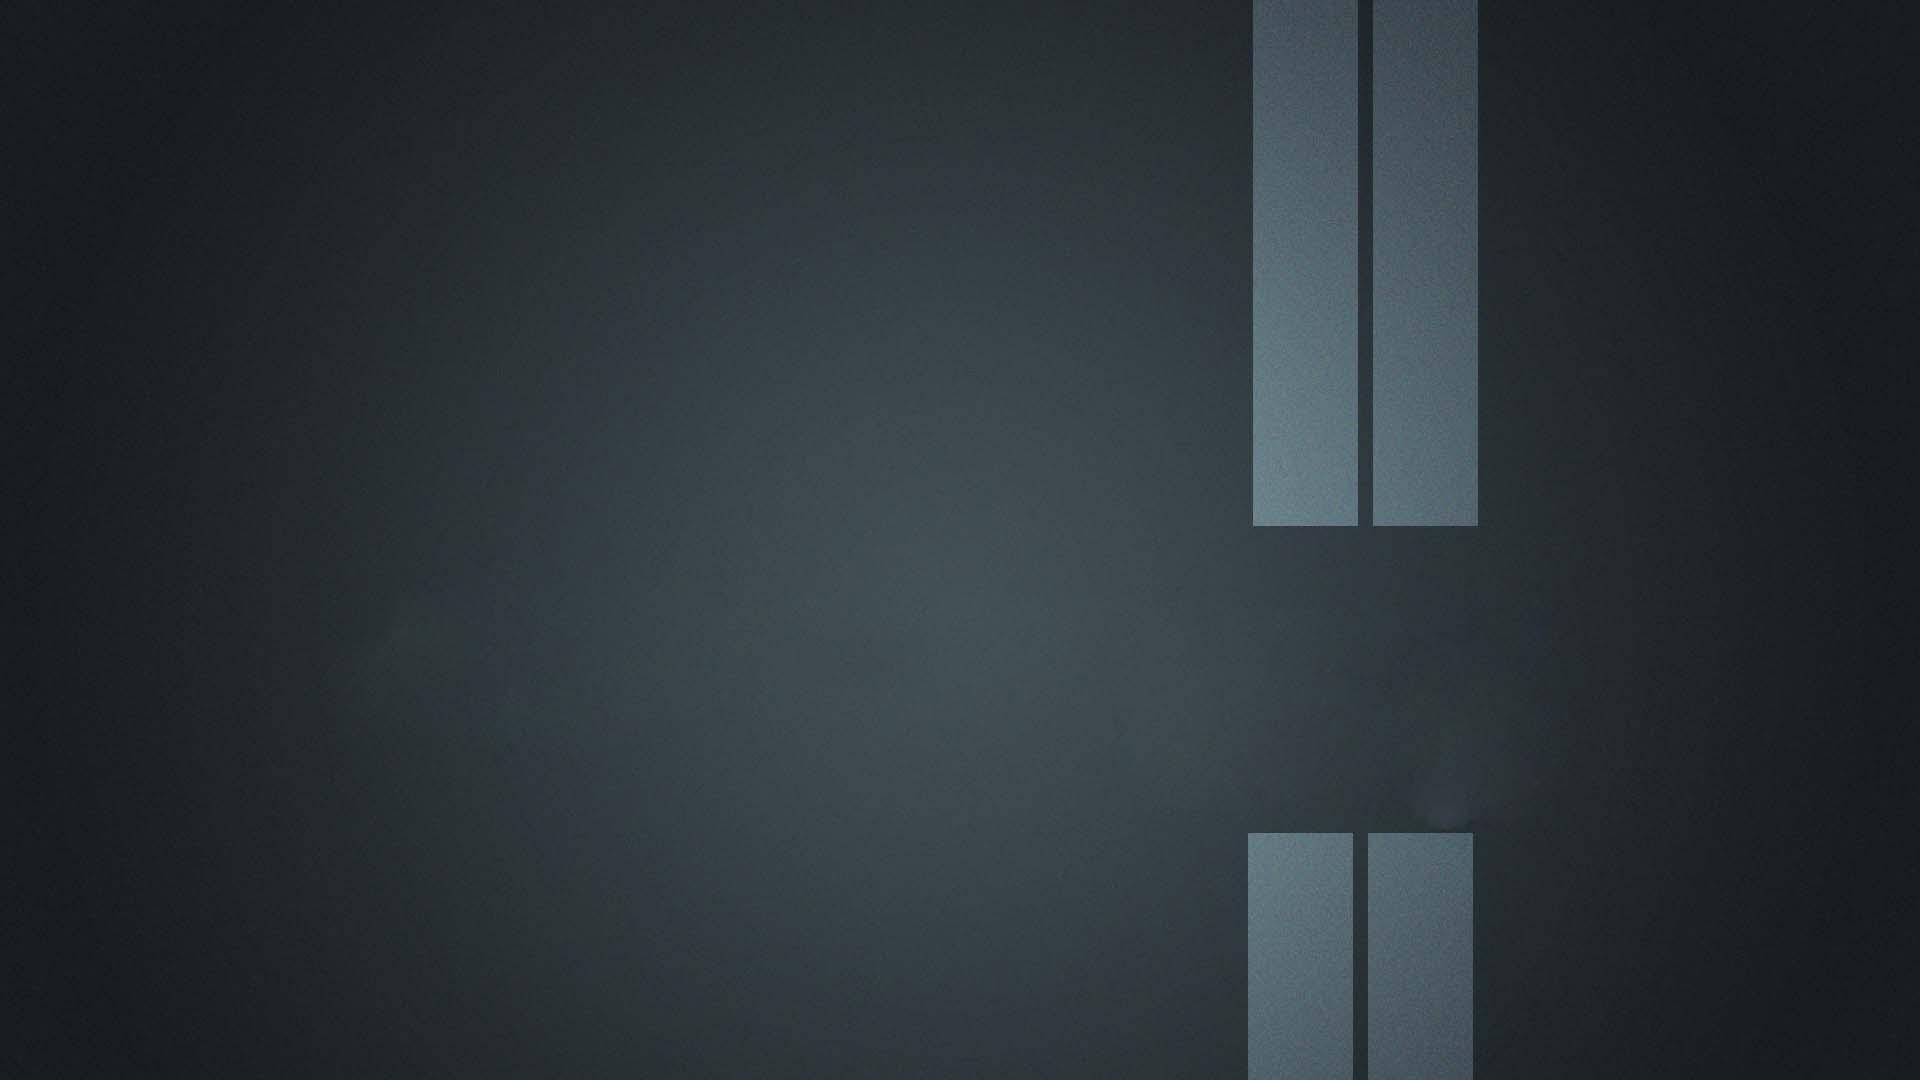 Plain black lamborghini wallpaper 5 hd wallpaper for Plain wallpaper